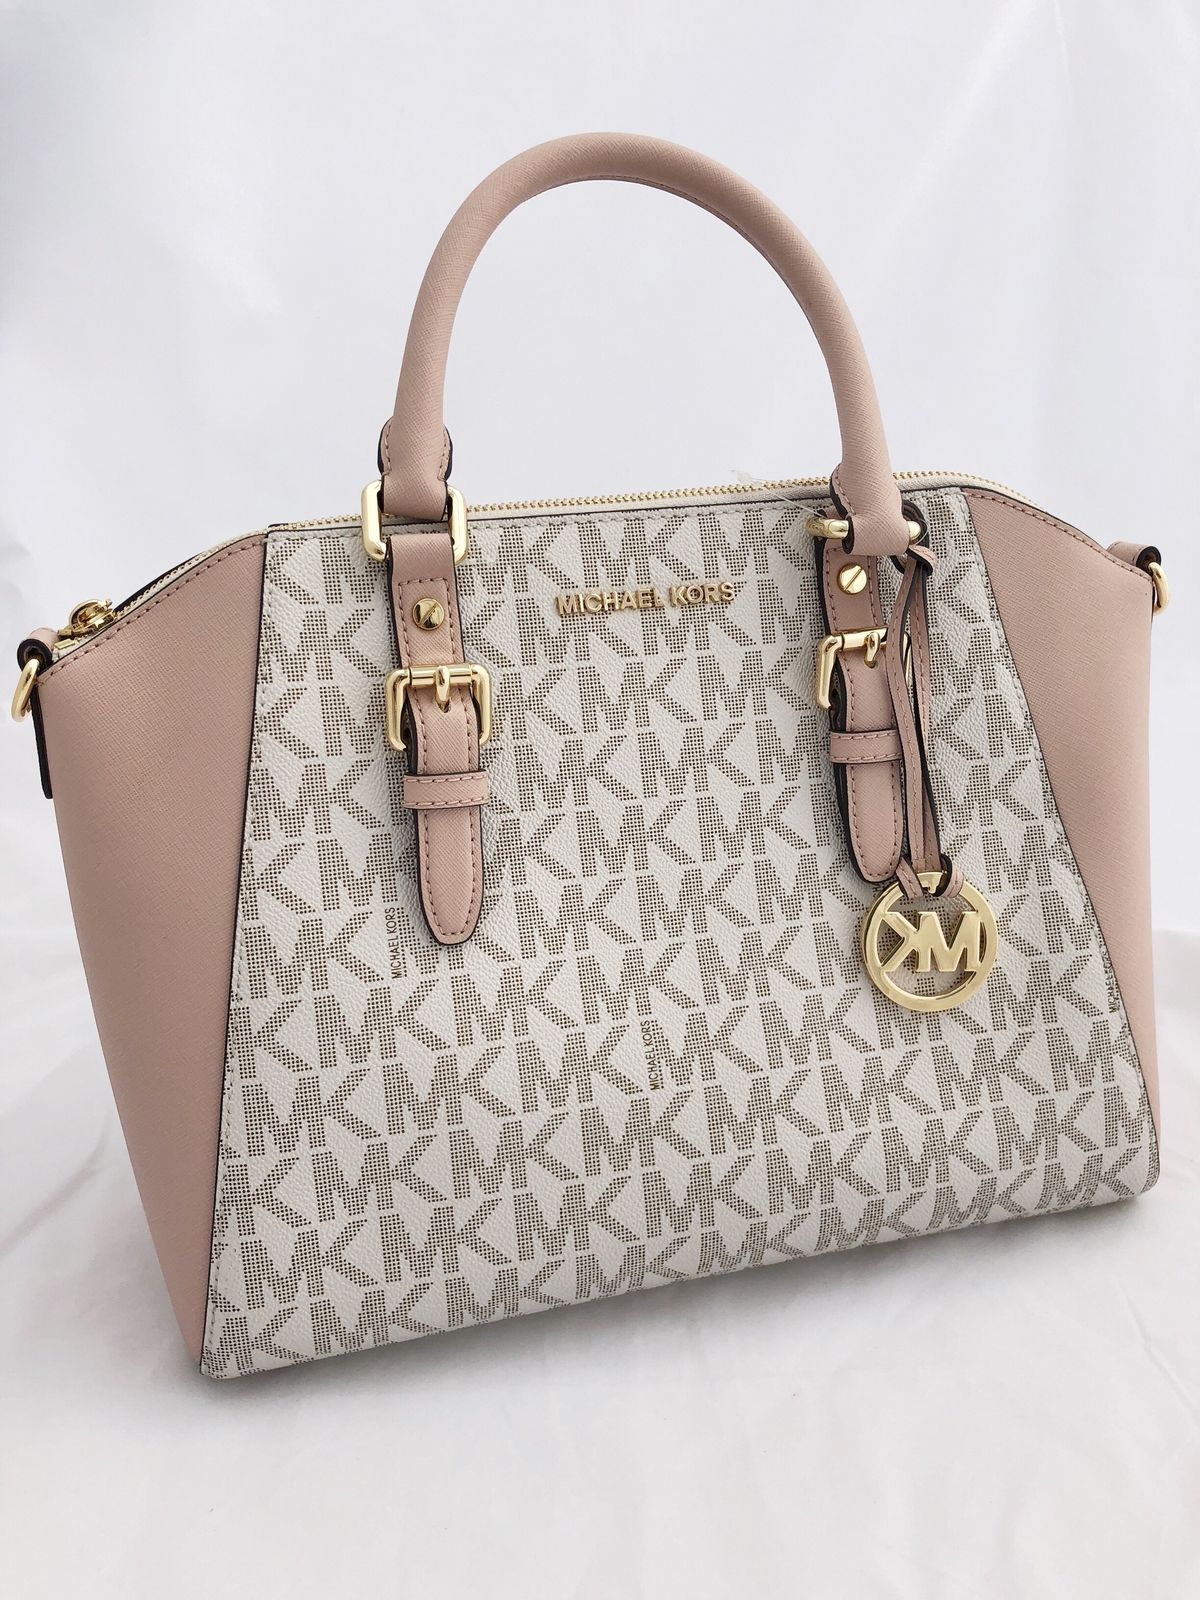 944d5c305dbe NWT Michael Kors Ciara Large Top Zip Satchel Vanilla Signature MK Ballet  Pink